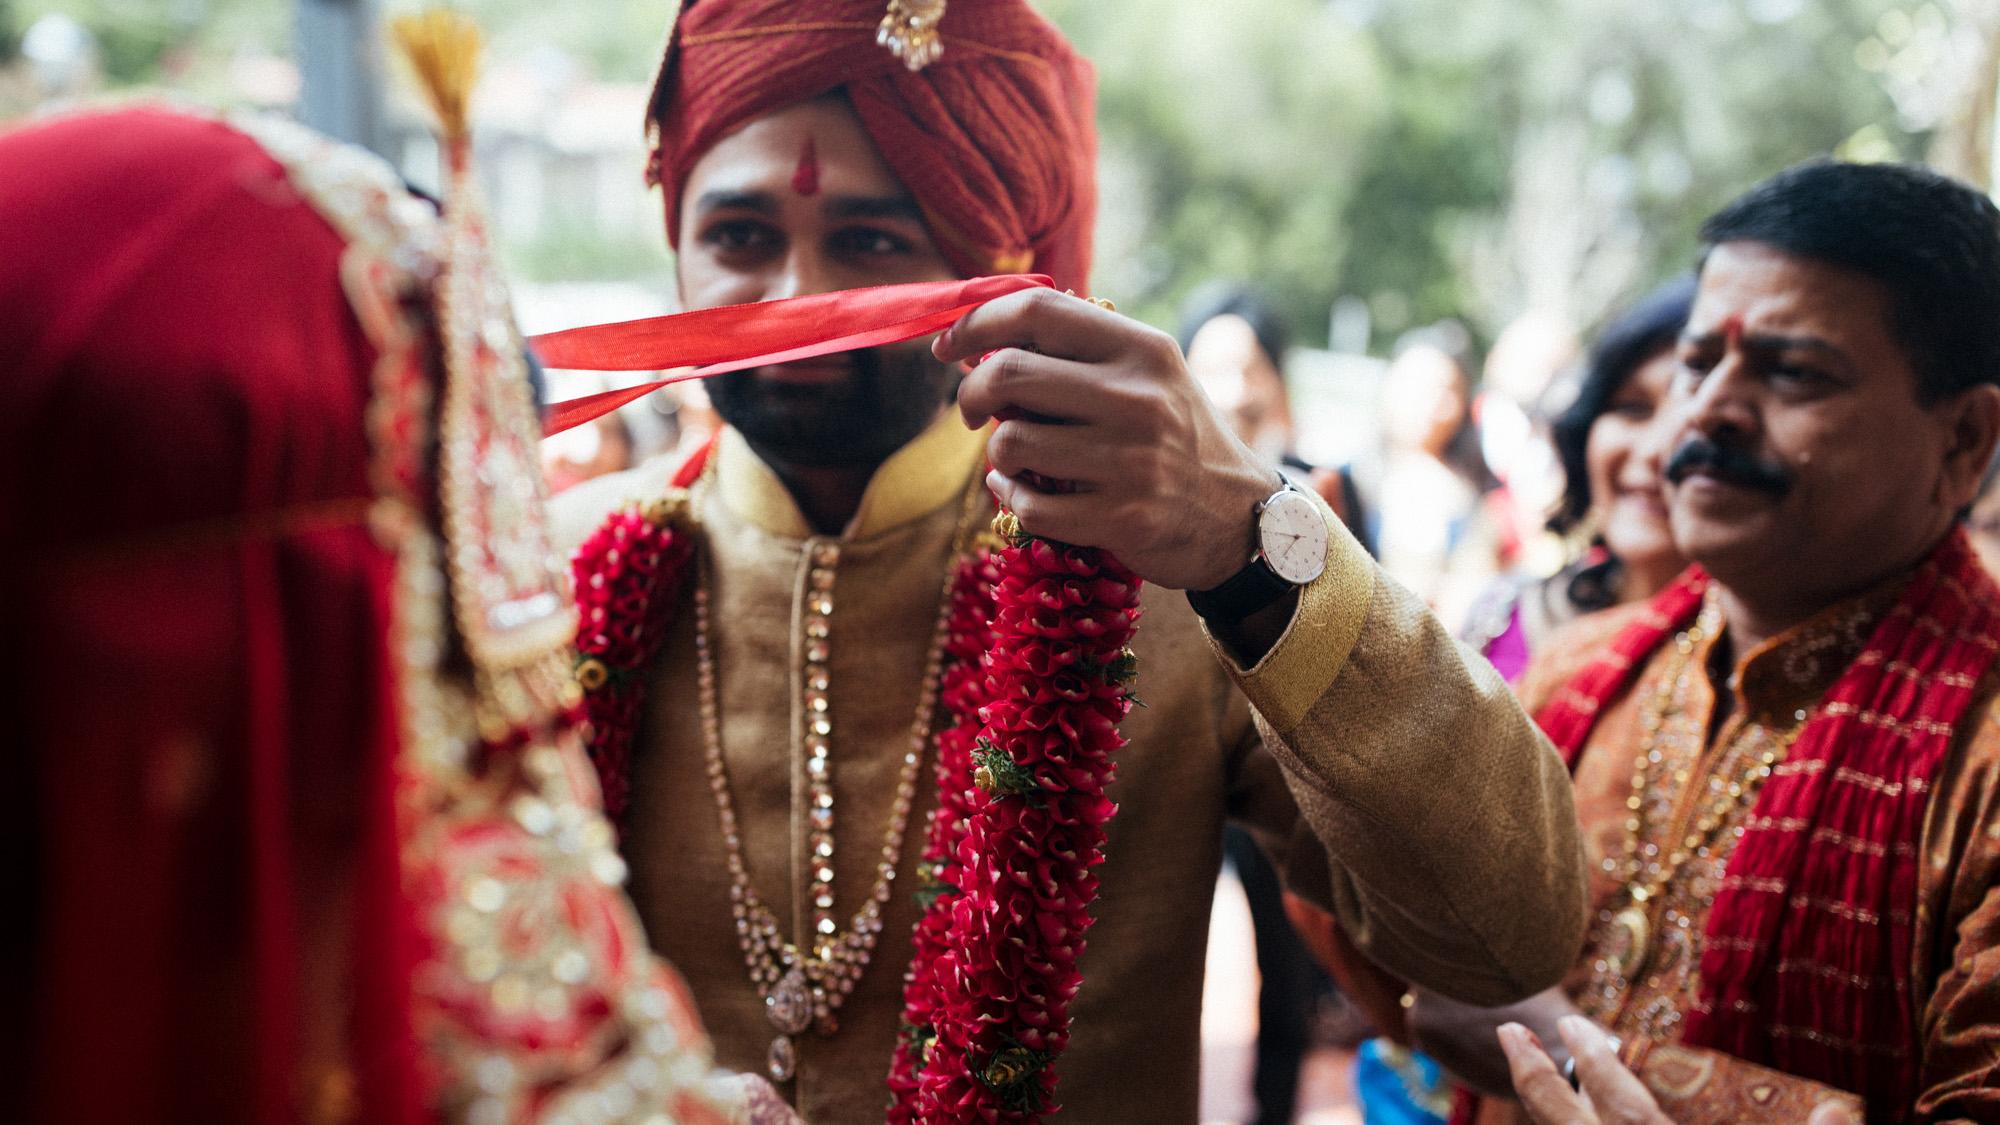 anu_maneesh_alec_vanderboom_Indian_wedding_photography-0083.jpg